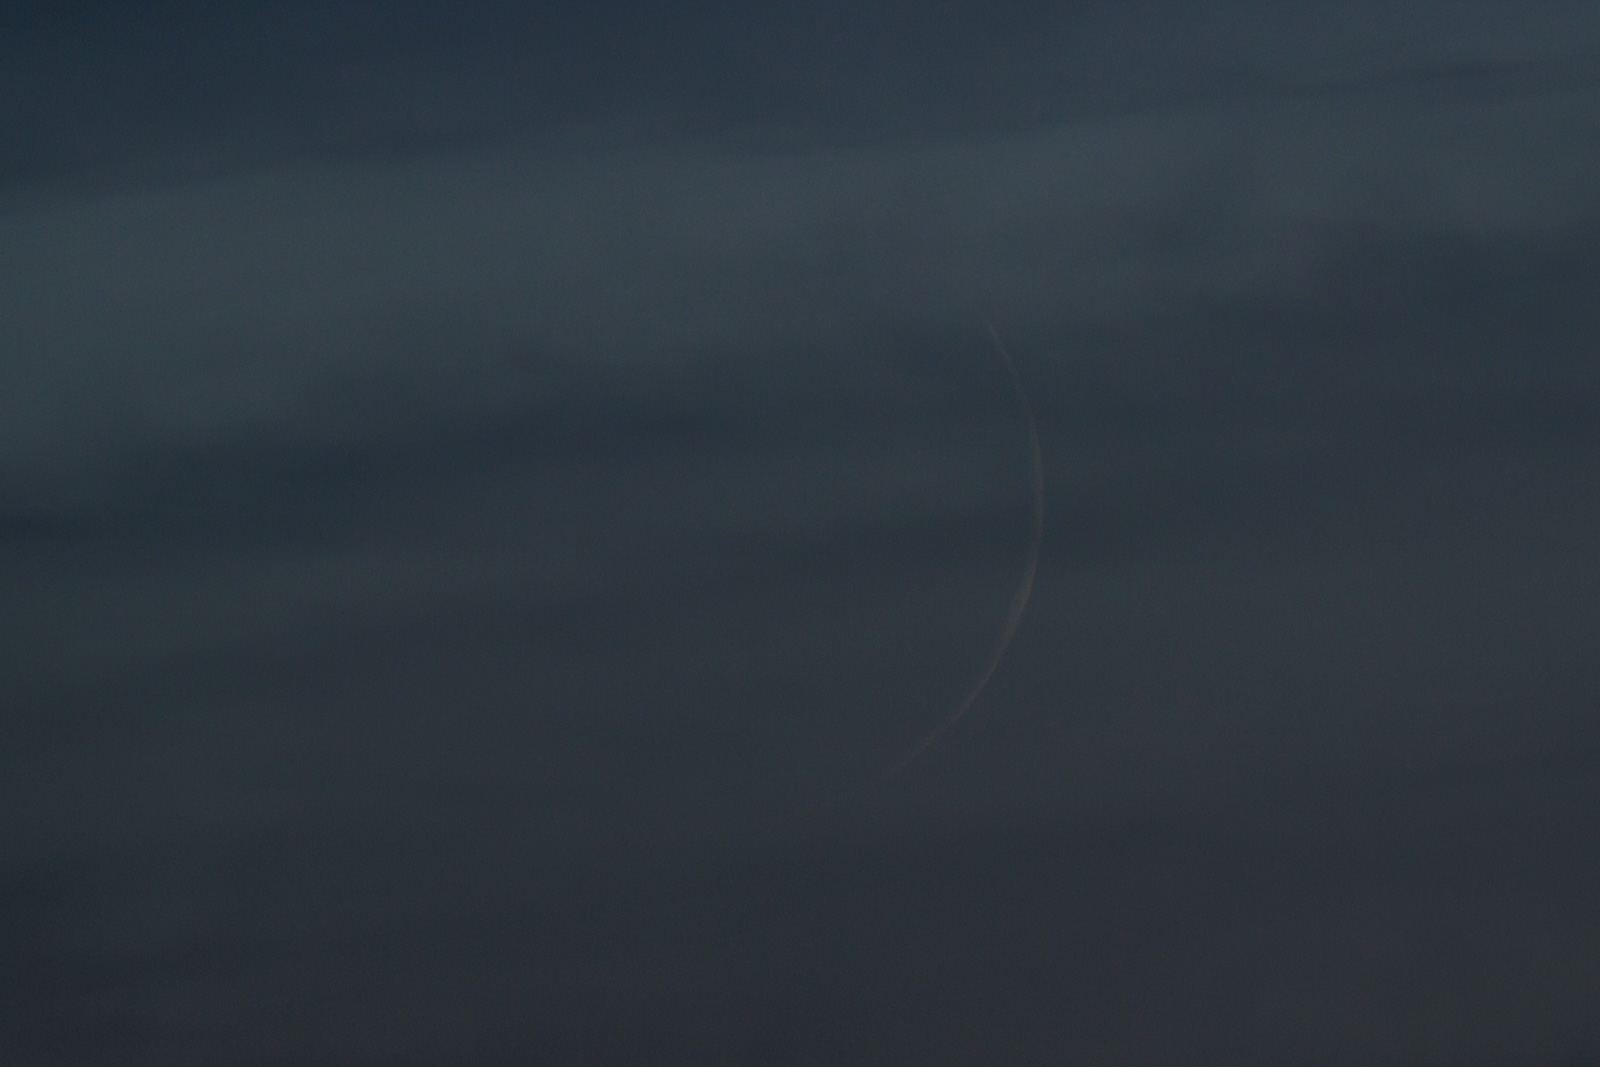 Moon 1.41d 2.8pc